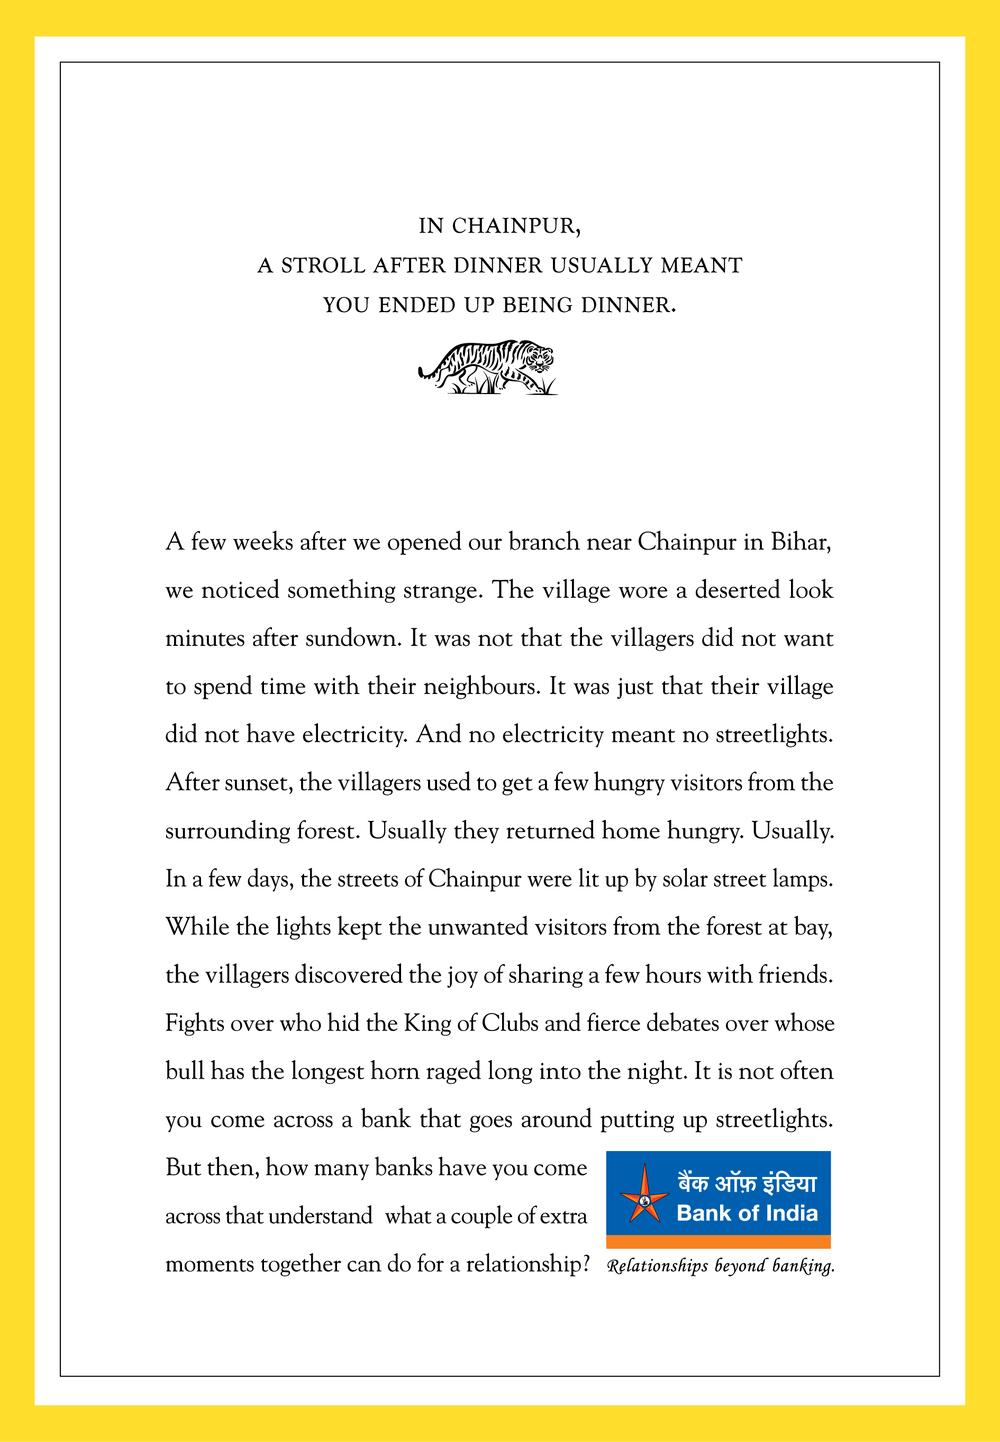 Bank of India Ad Print Campaign - Vinod Sudheer